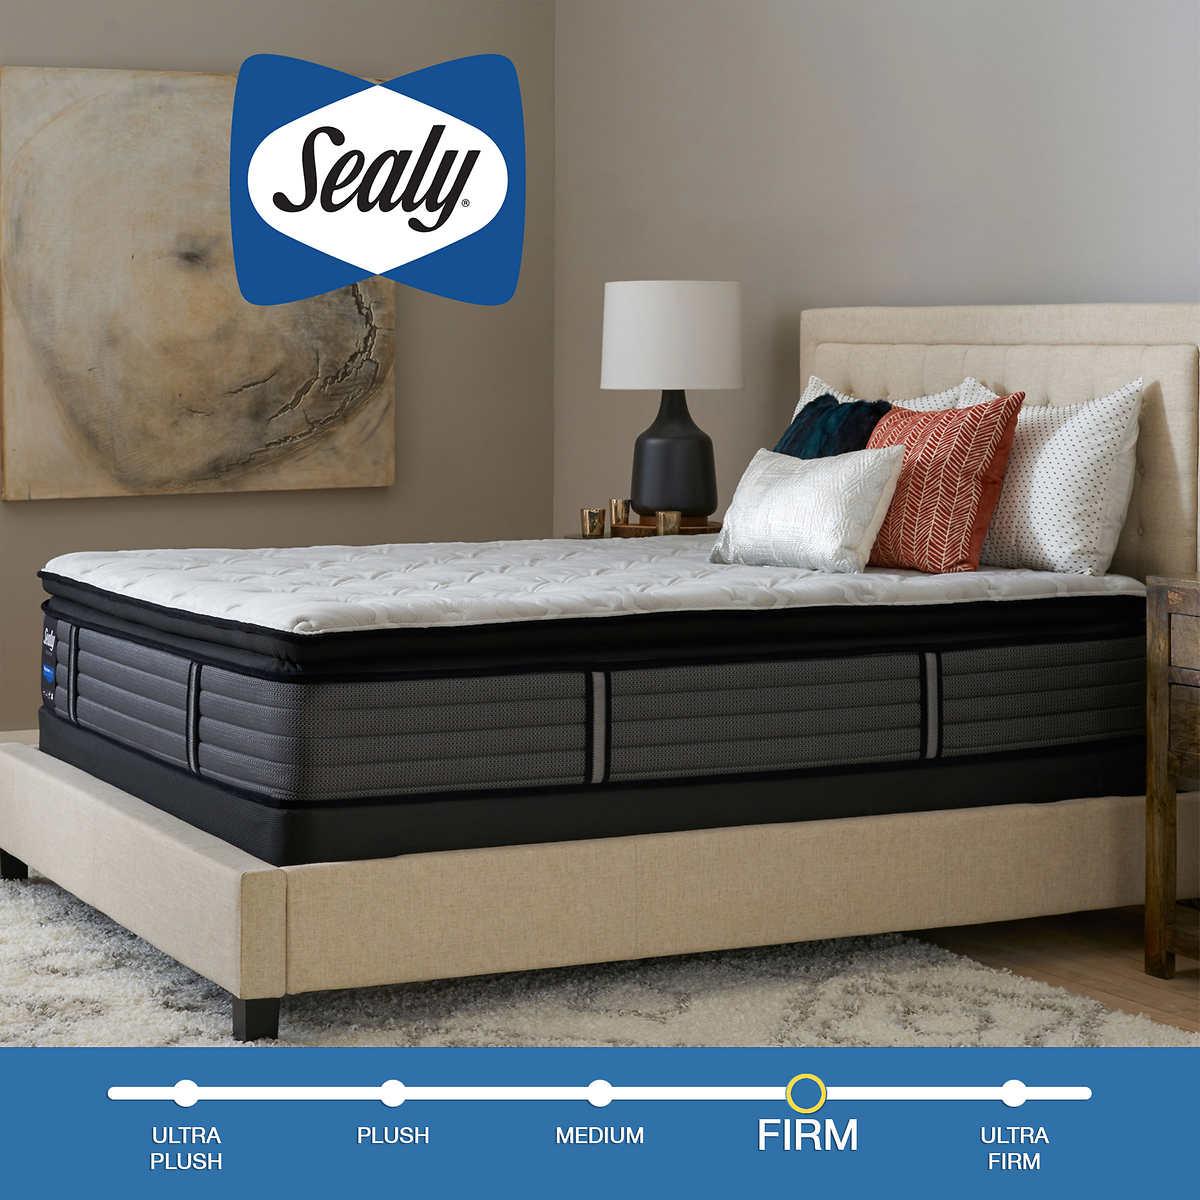 sealy response performance prospect lake cf twin full mattress pack